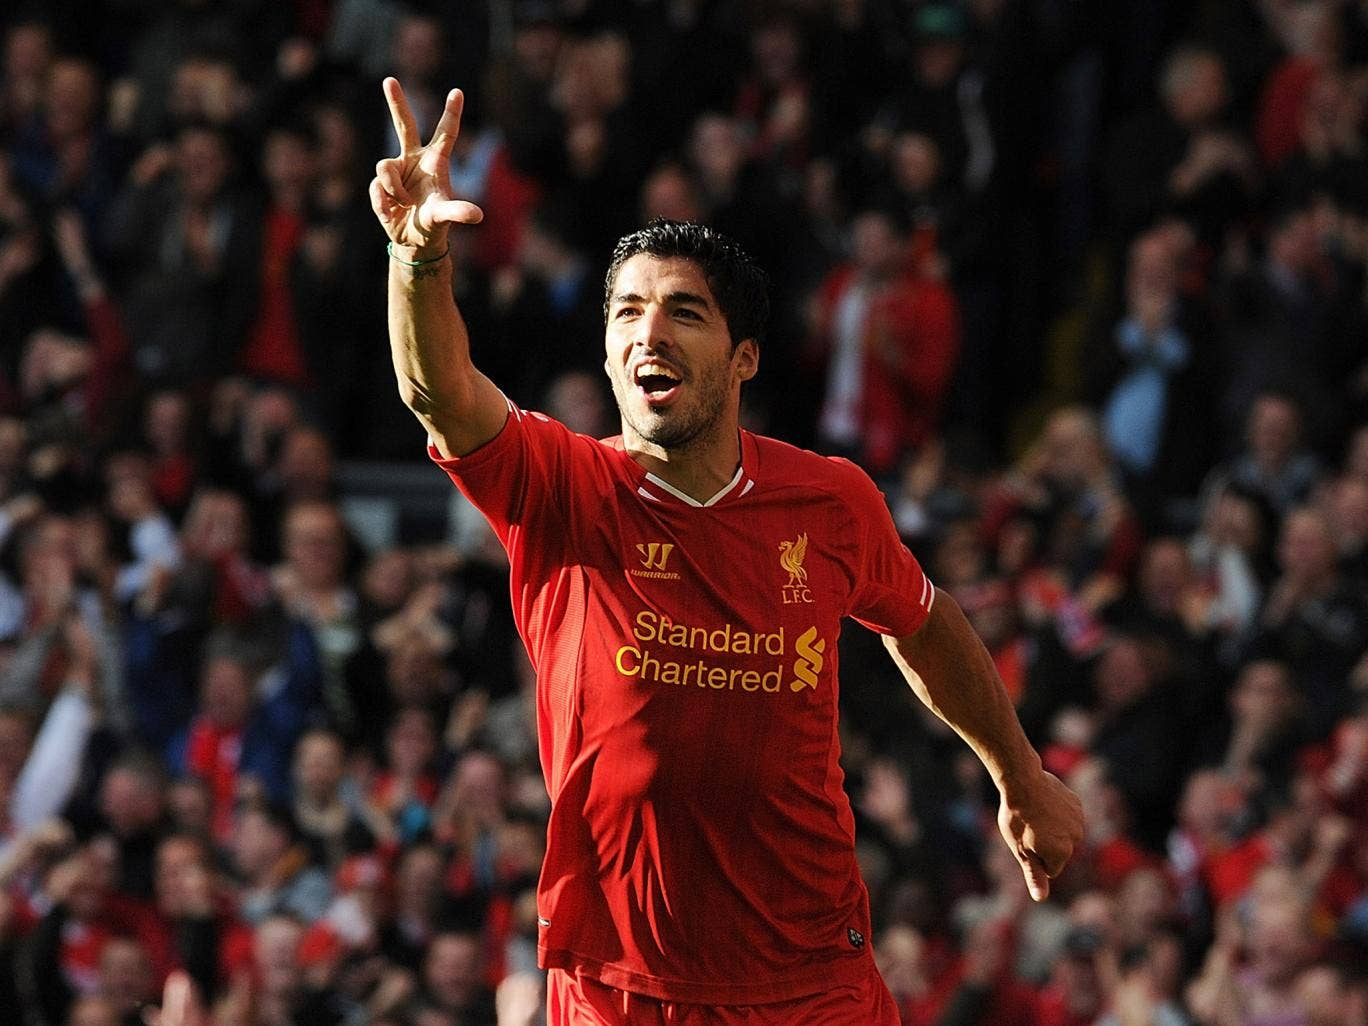 Luis Suarez celebrates his hat-trick for Liverpool against West Brom